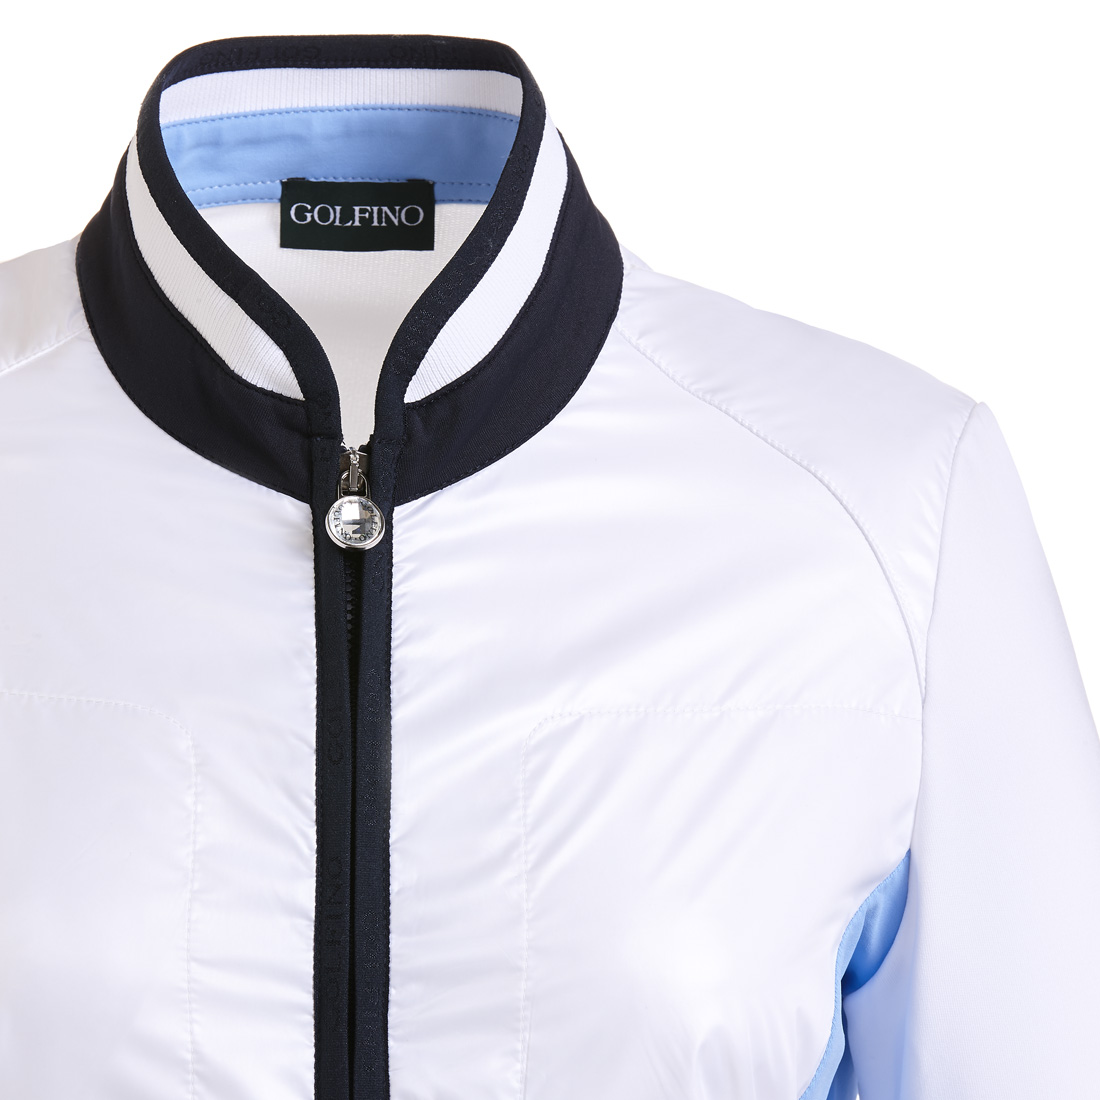 Golfino Damen Funktions-Stretchjacke Polarlight